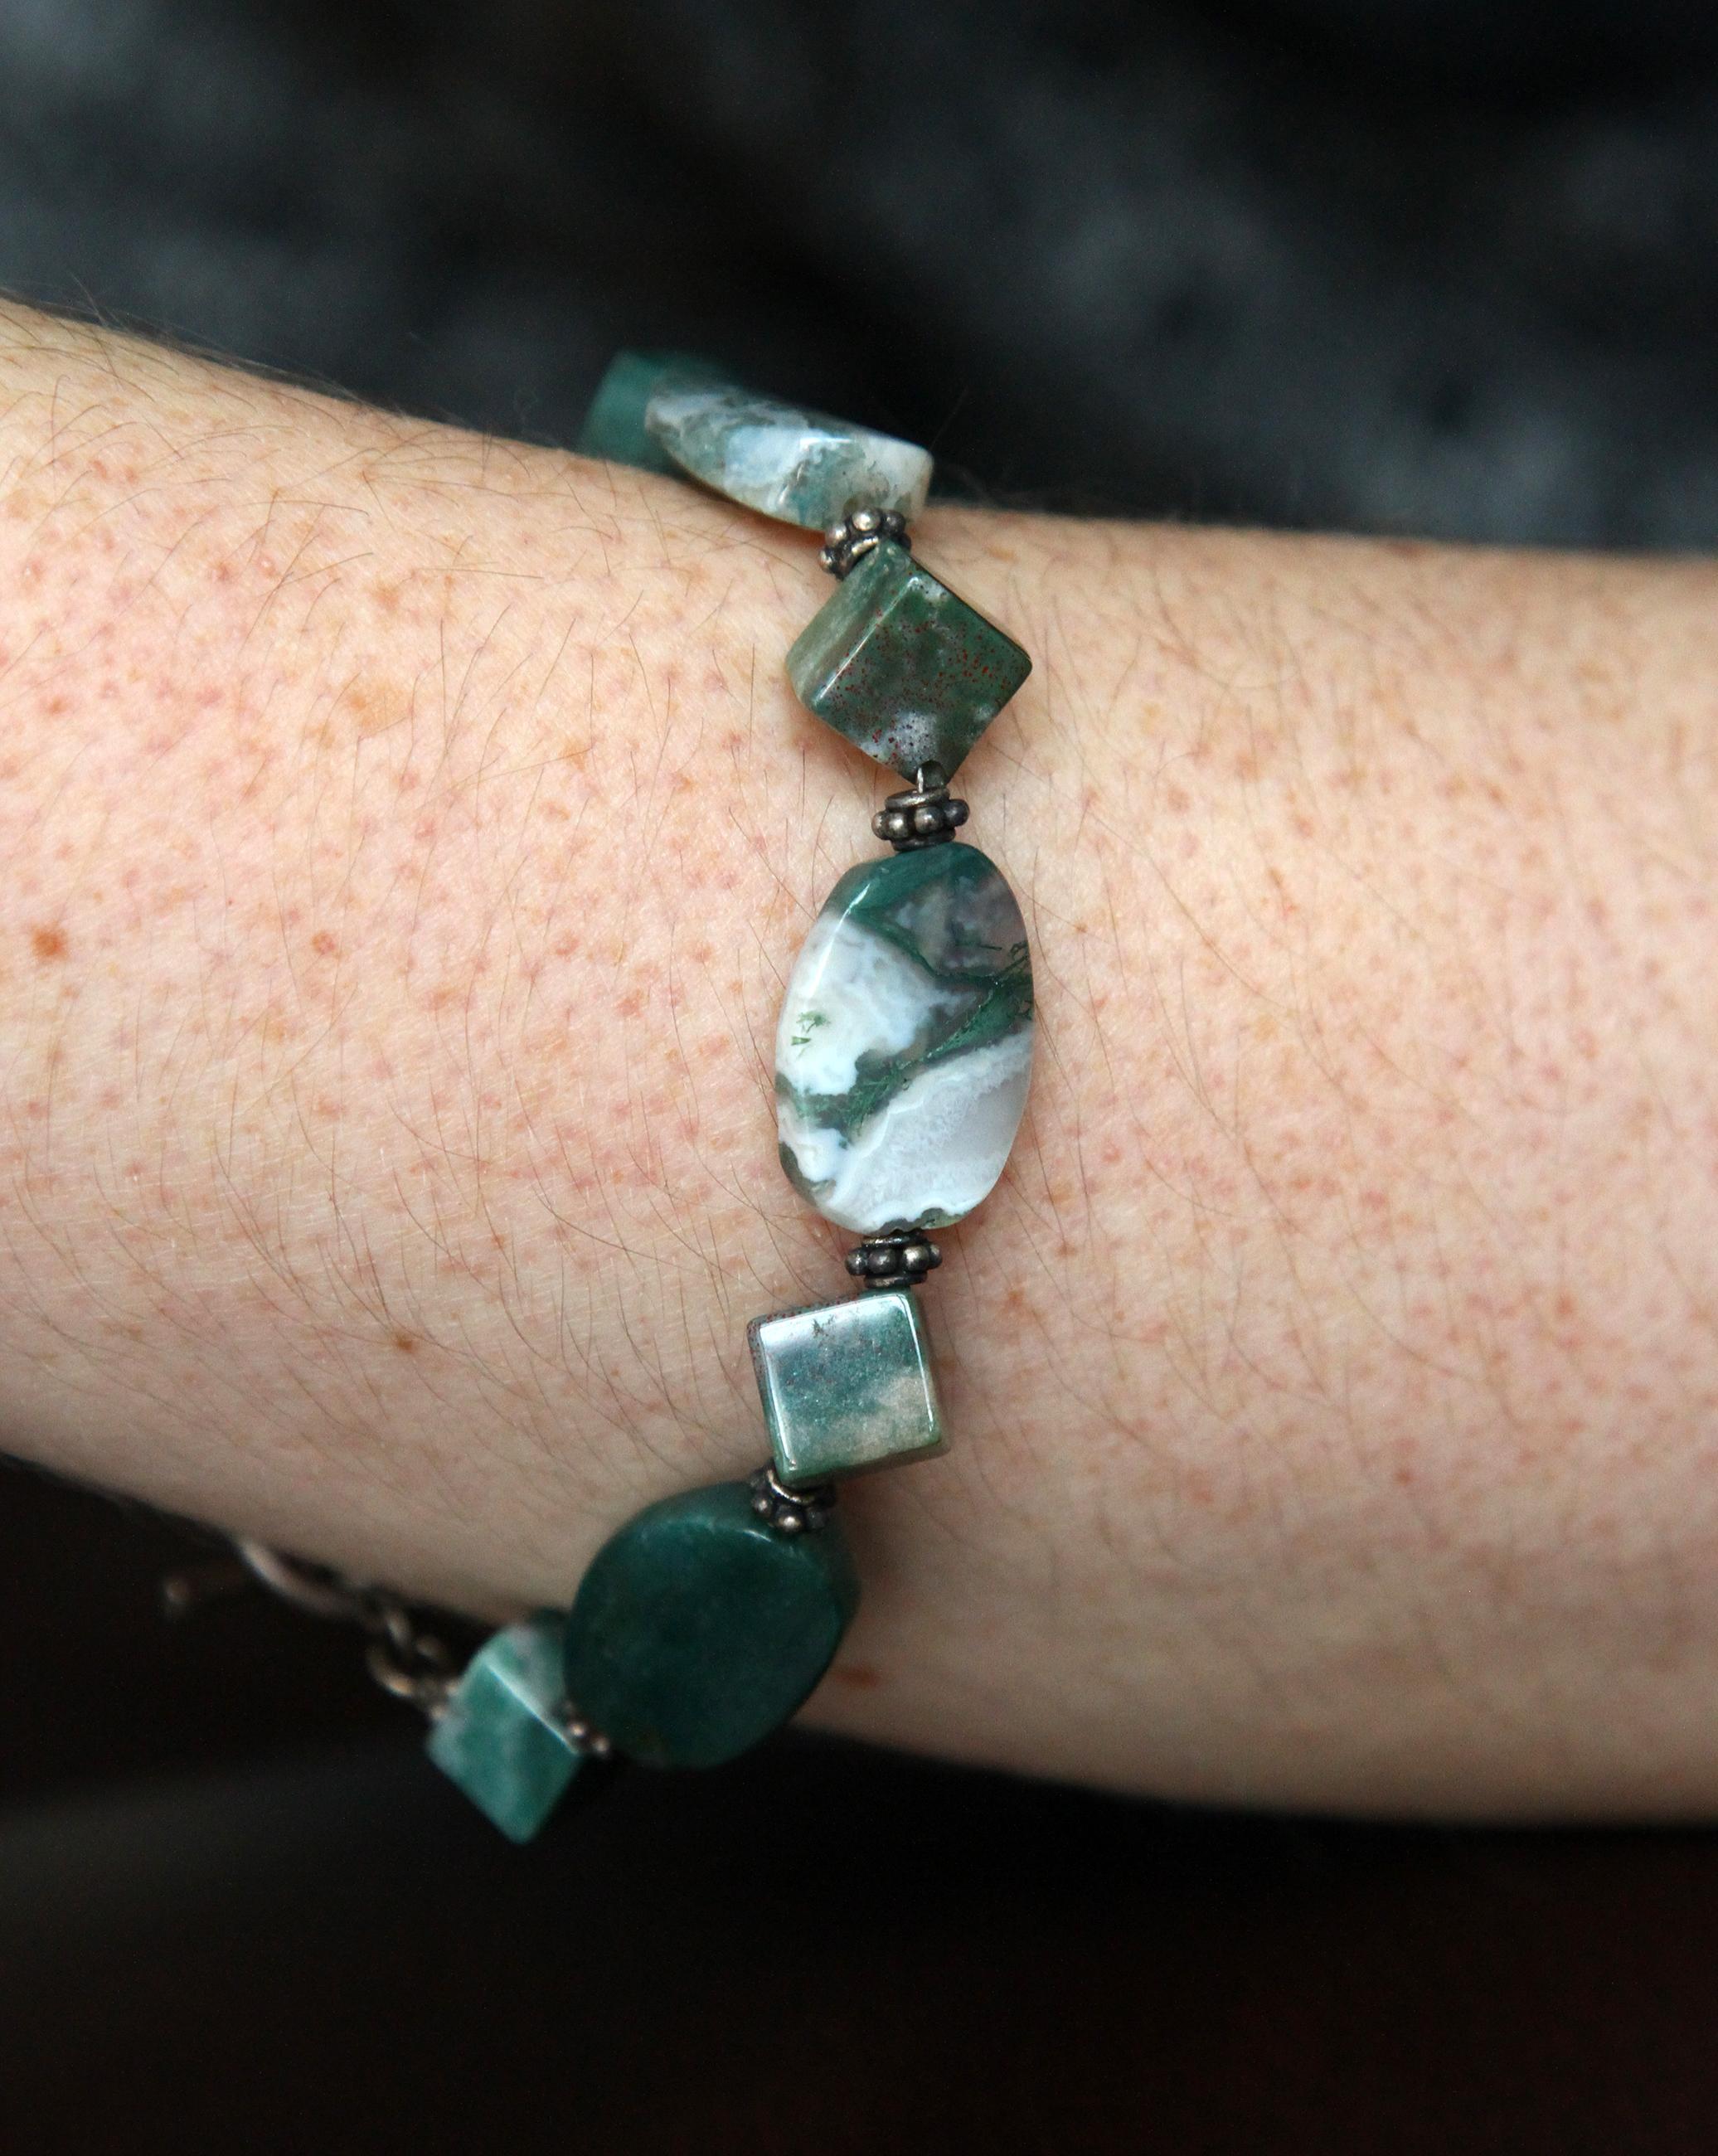 semiprecious-stone-bracelet_001.JPG